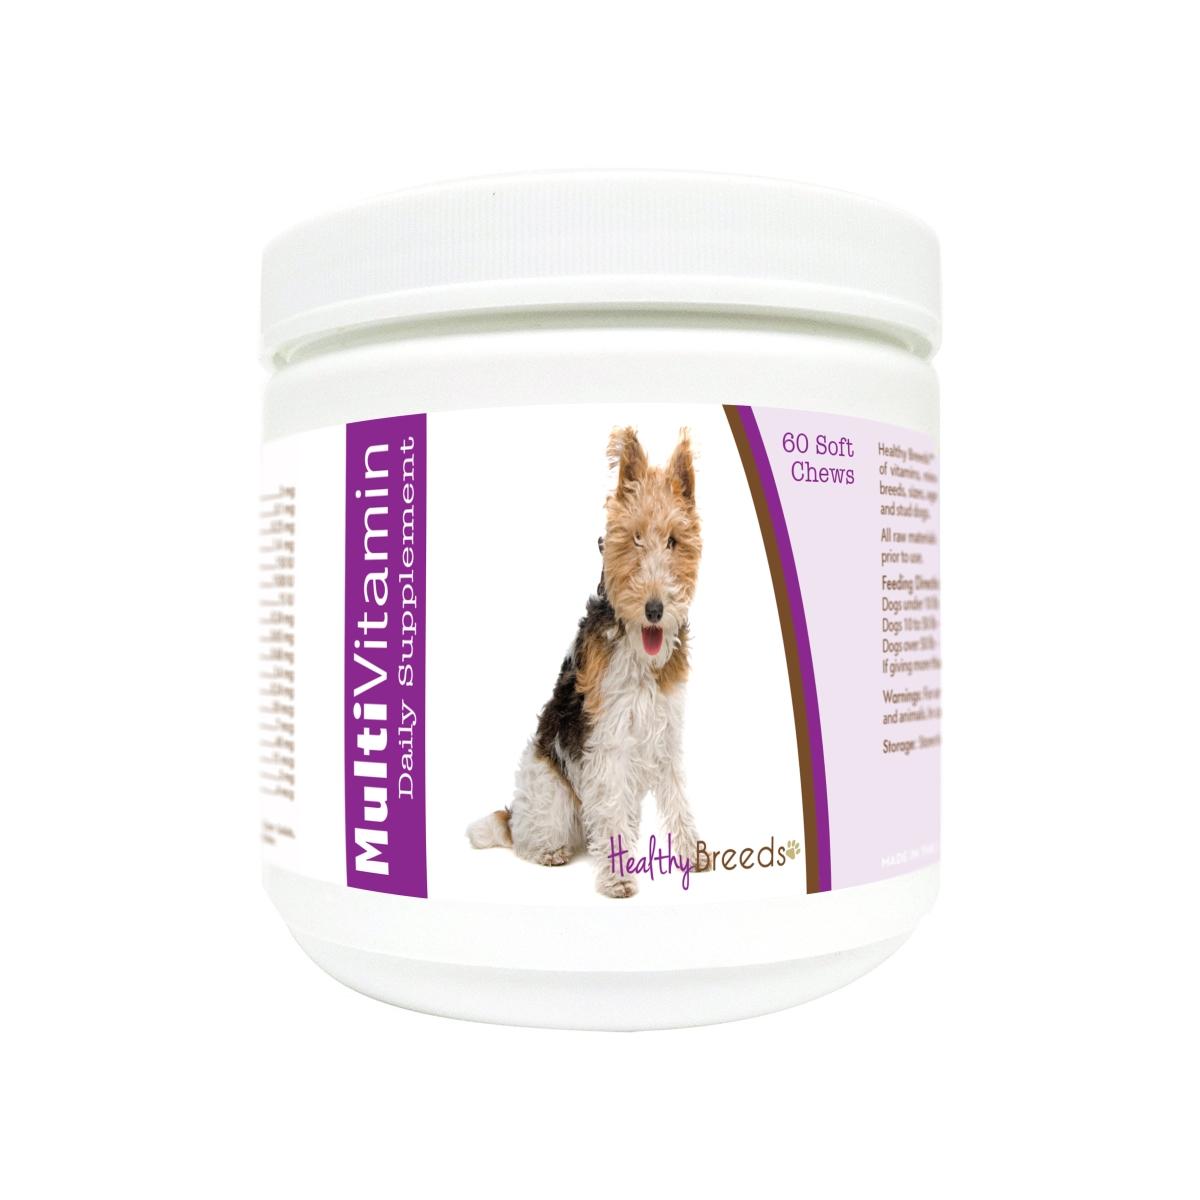 Healthy Breeds 840235179955 Wire Fox Terrier Multi-Vitamin Soft Chews - 60 Count